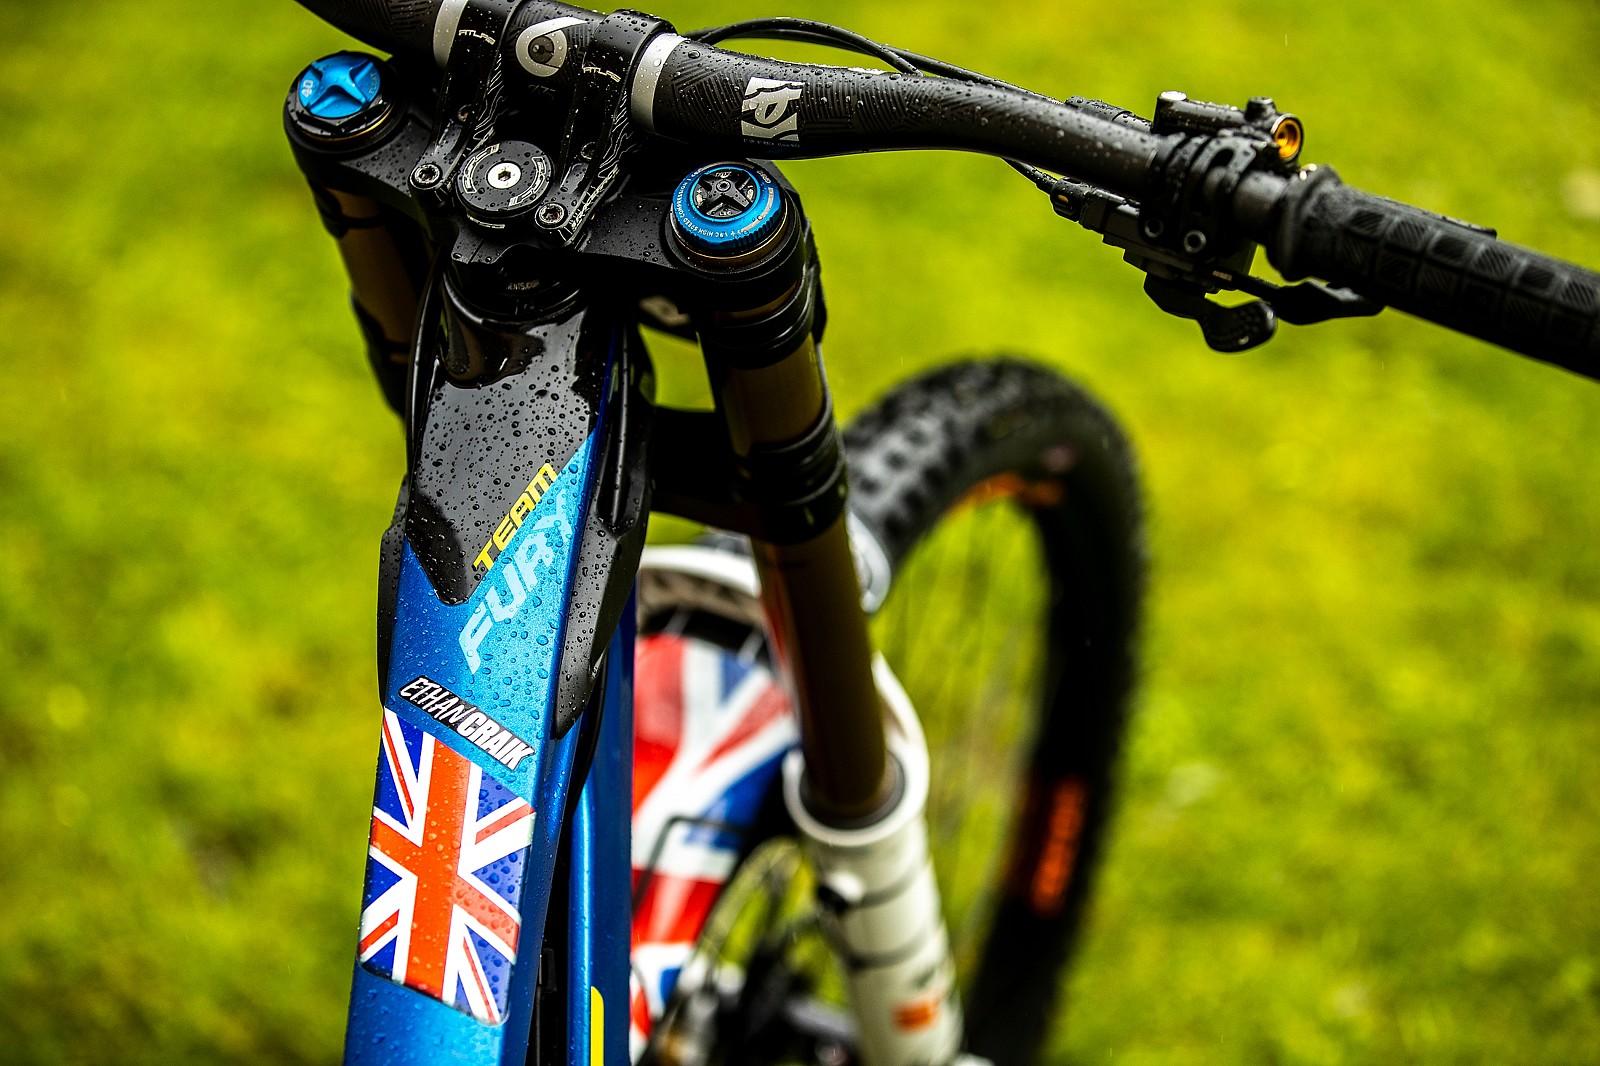 Ethan Craik's GT Fury - WORLD CHAMPS BIKES - GT Factory Racing - Mountain Biking Pictures - Vital MTB